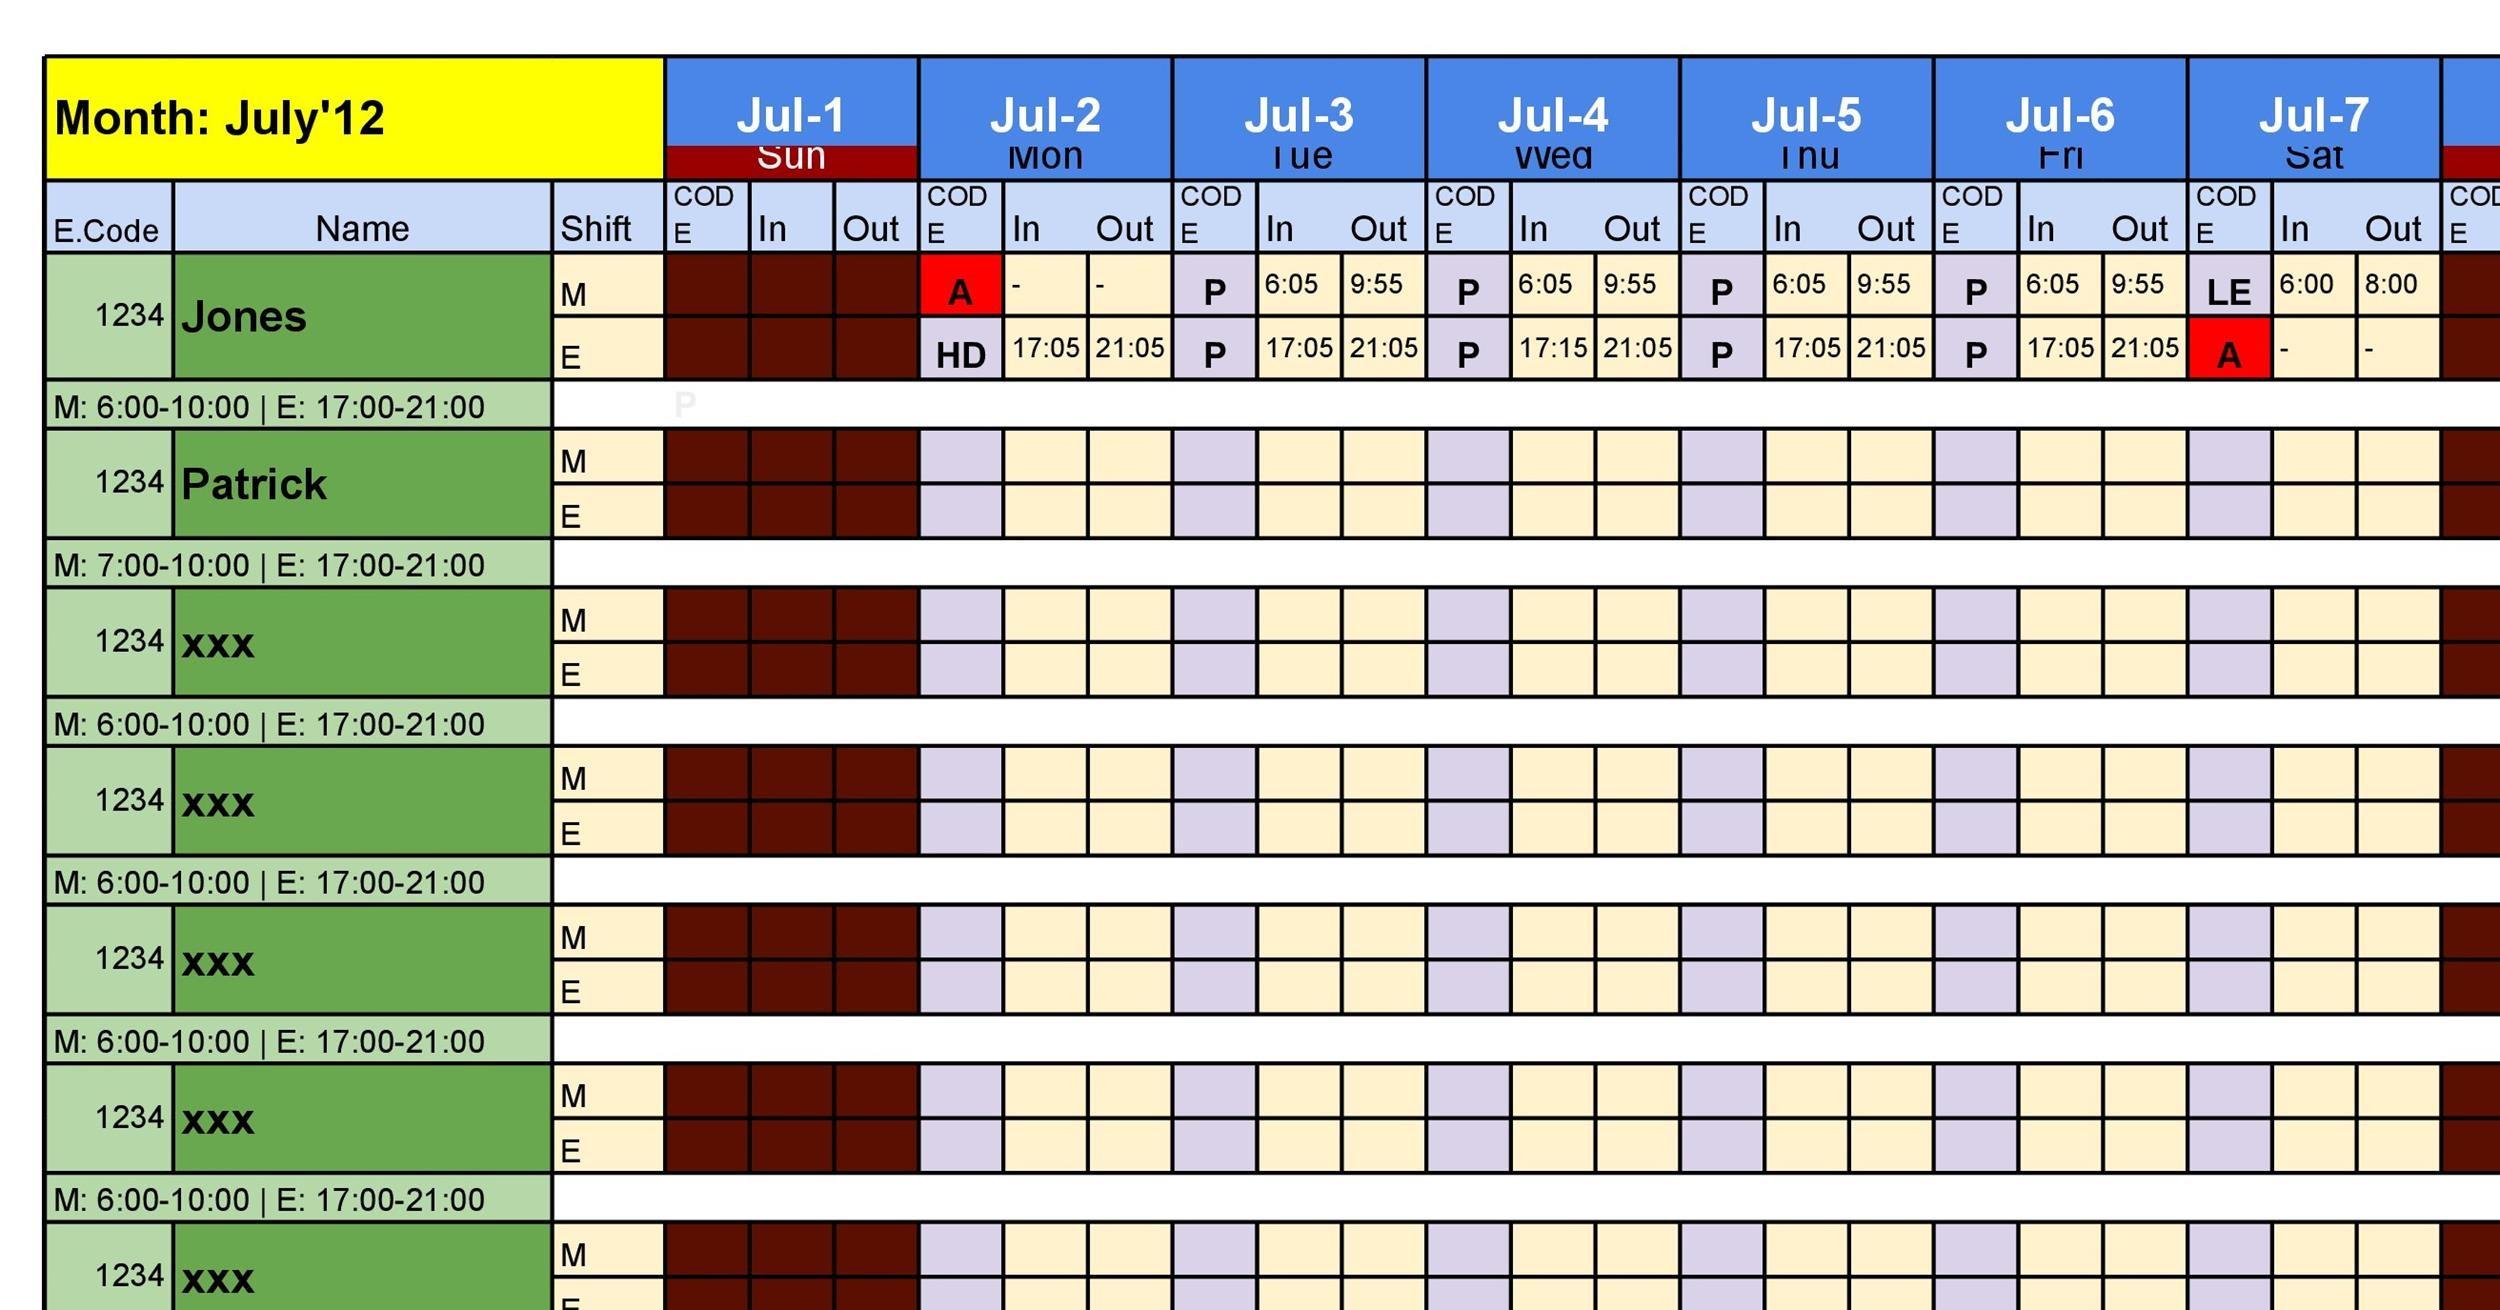 38 Free Printable Attendance Sheet Templates - printable attendance chart